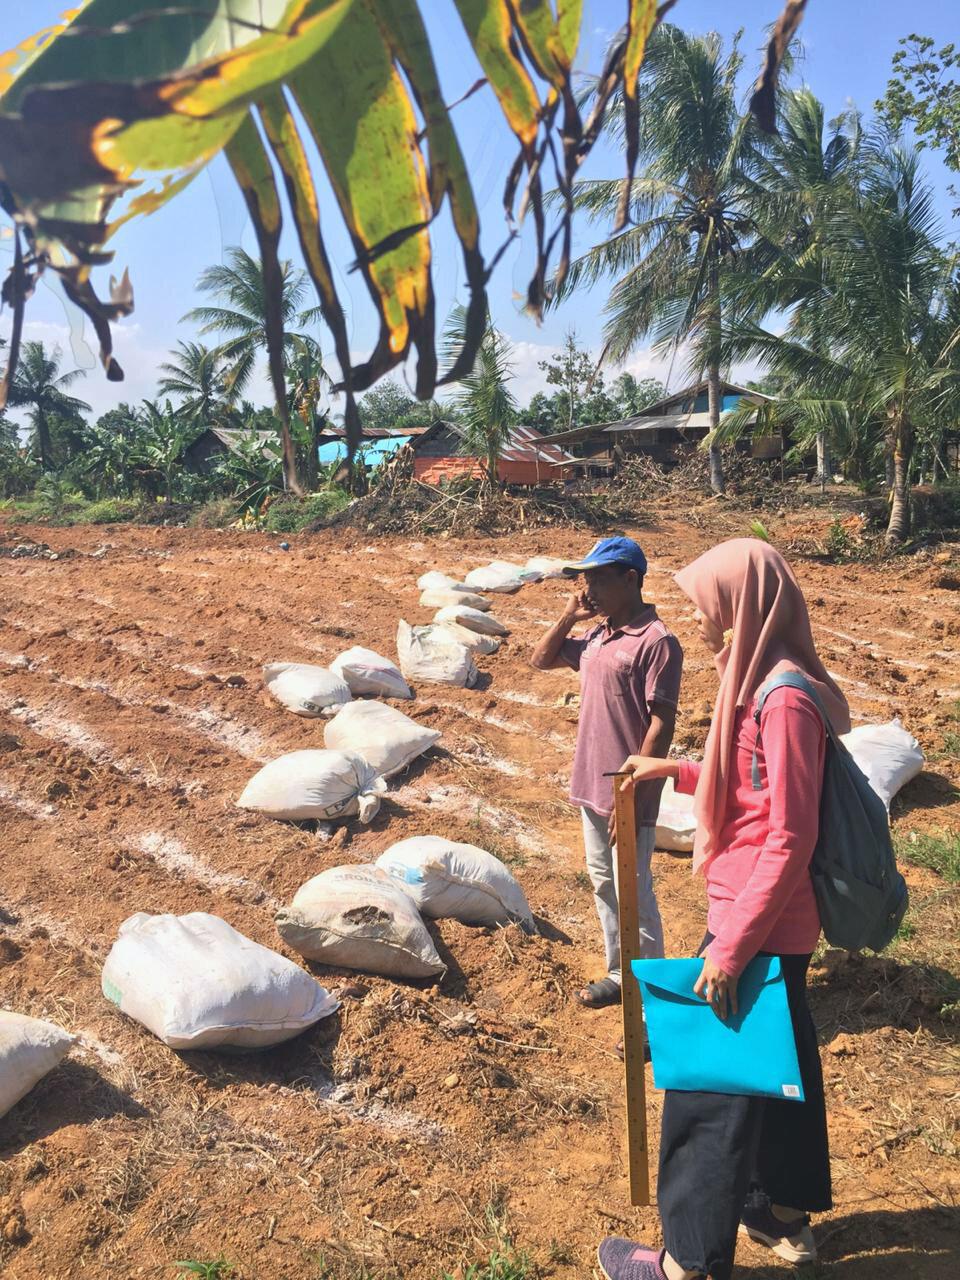 Surveying an odot grass planting site for animal feed, Pulau Sari village, KalSel, August 2019.  Photo: Ridhona Edriantina